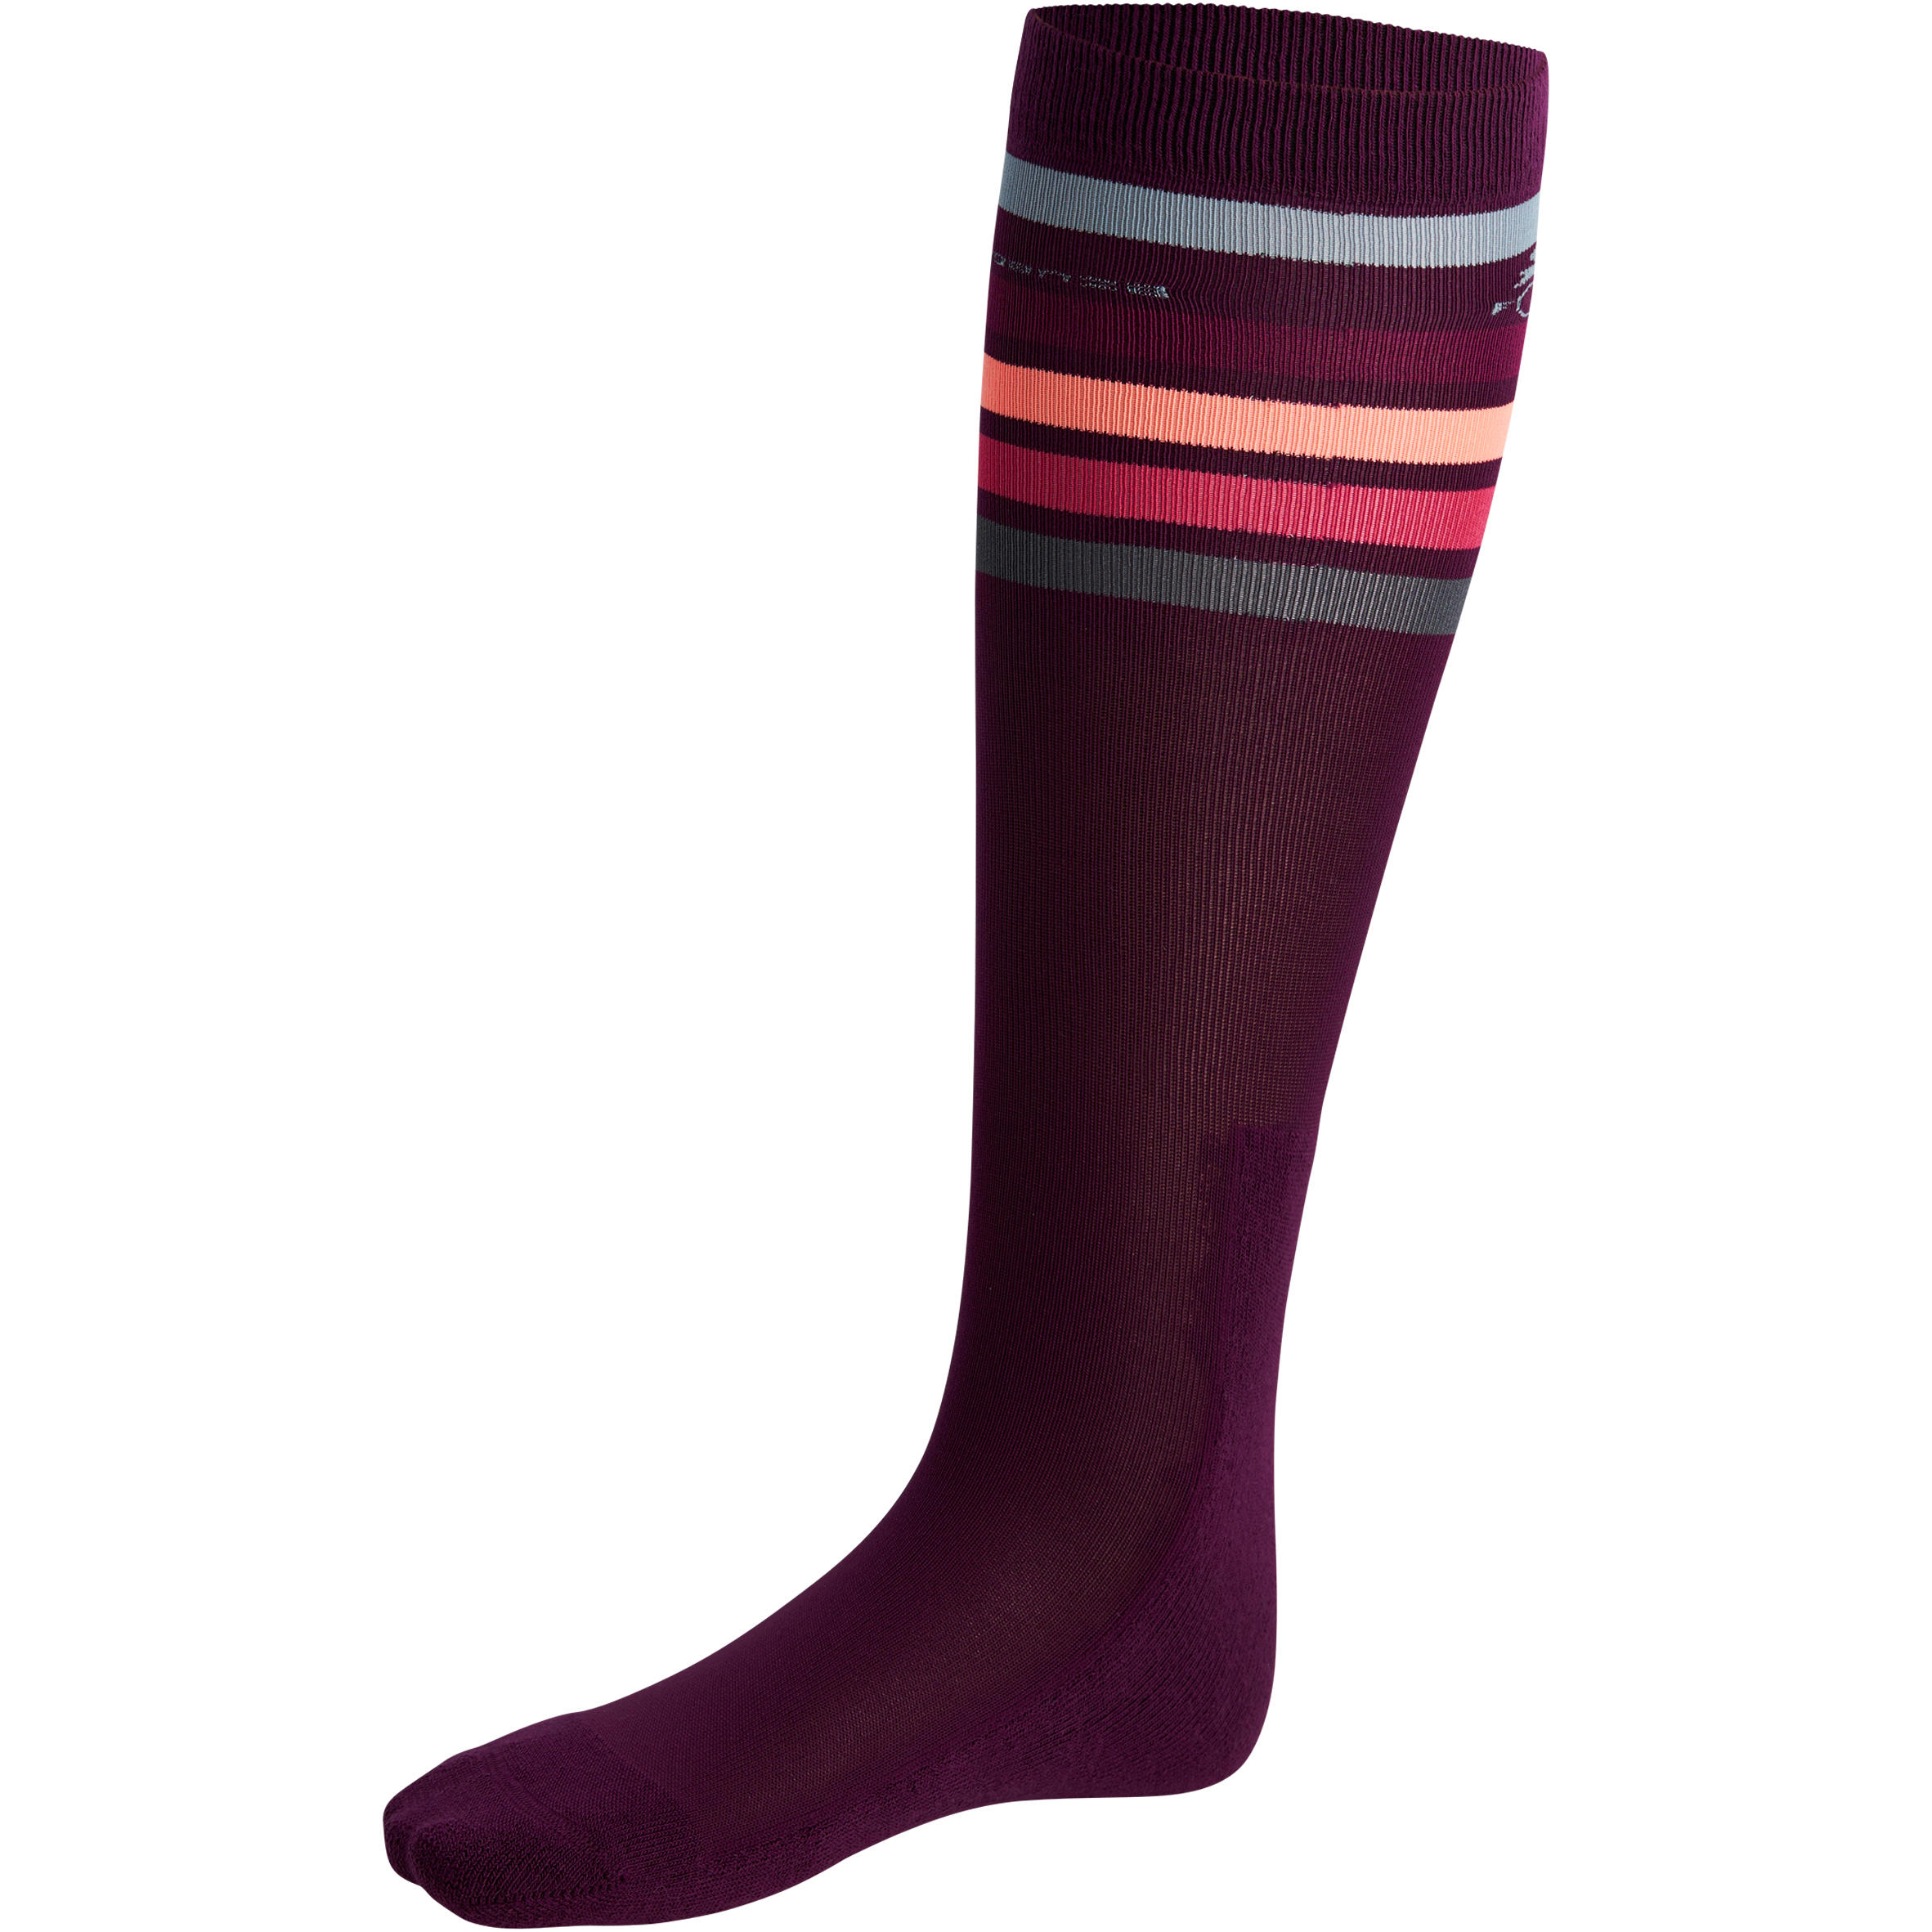 Adult Horse riding socks basic as purple/pink/orange